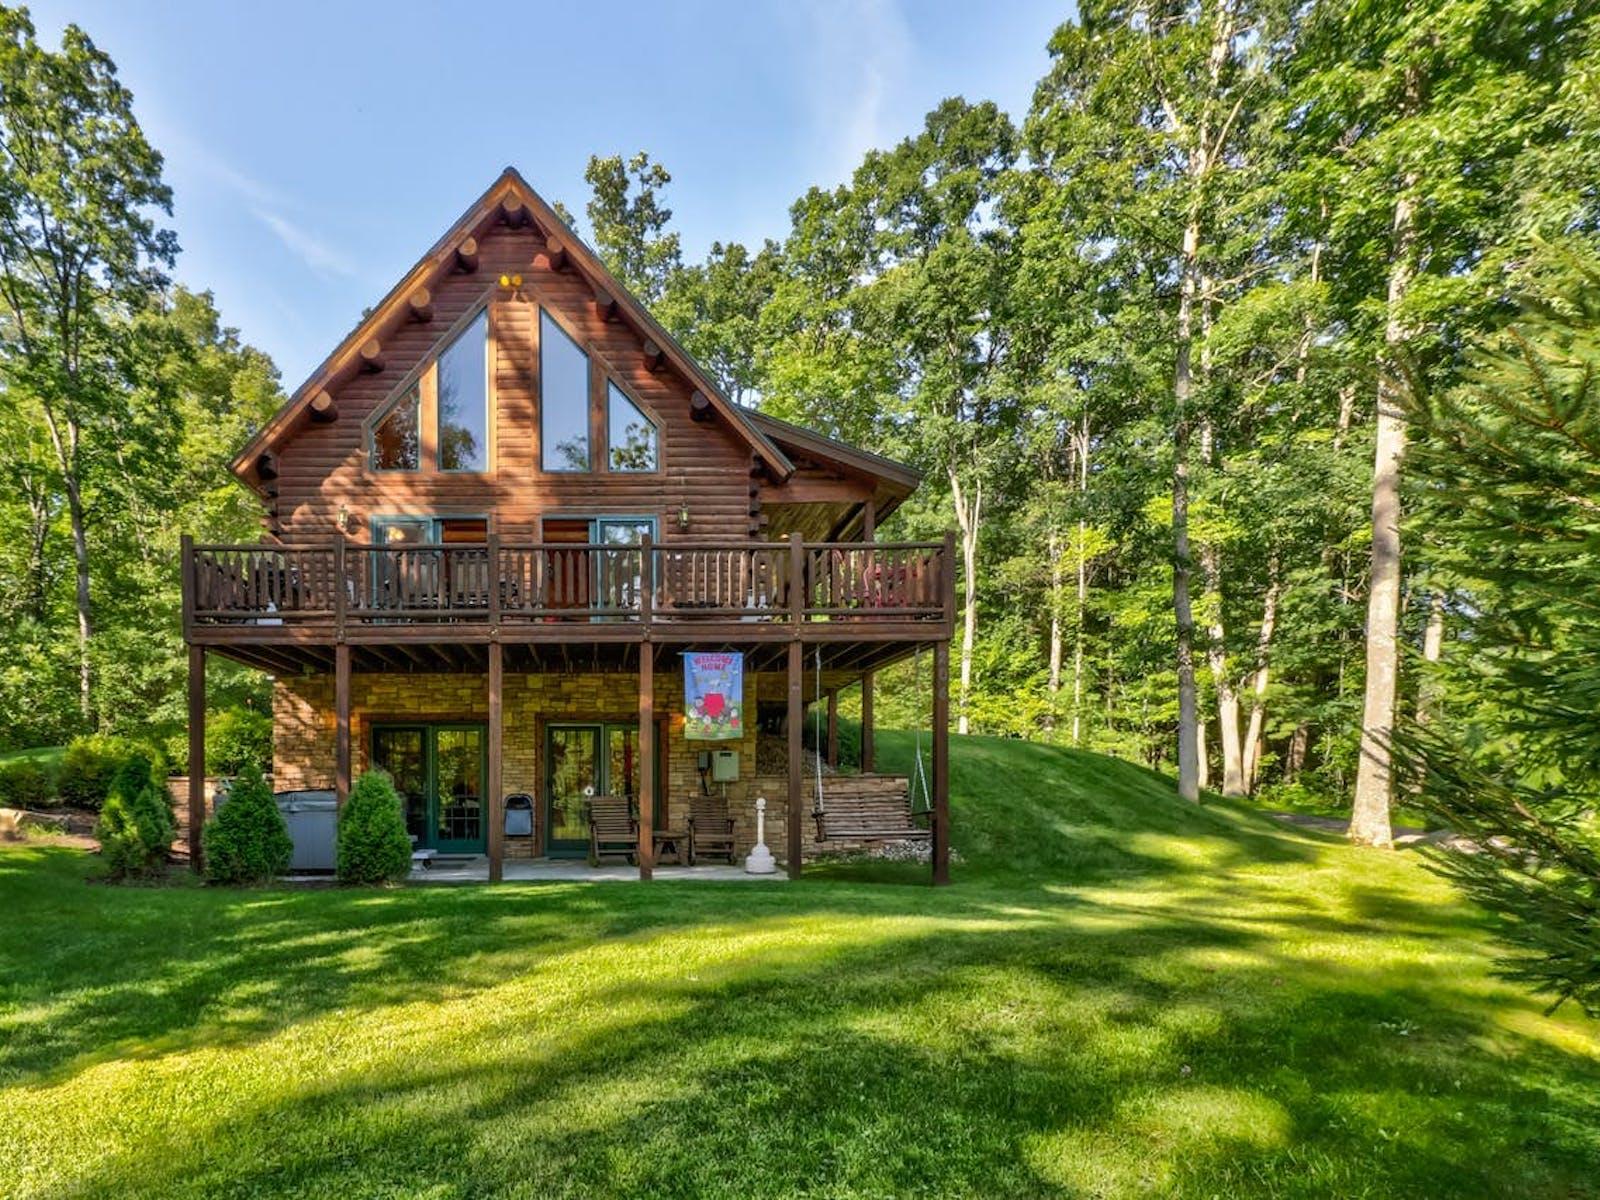 Cabin rental located in sunny Deep Creek Lake